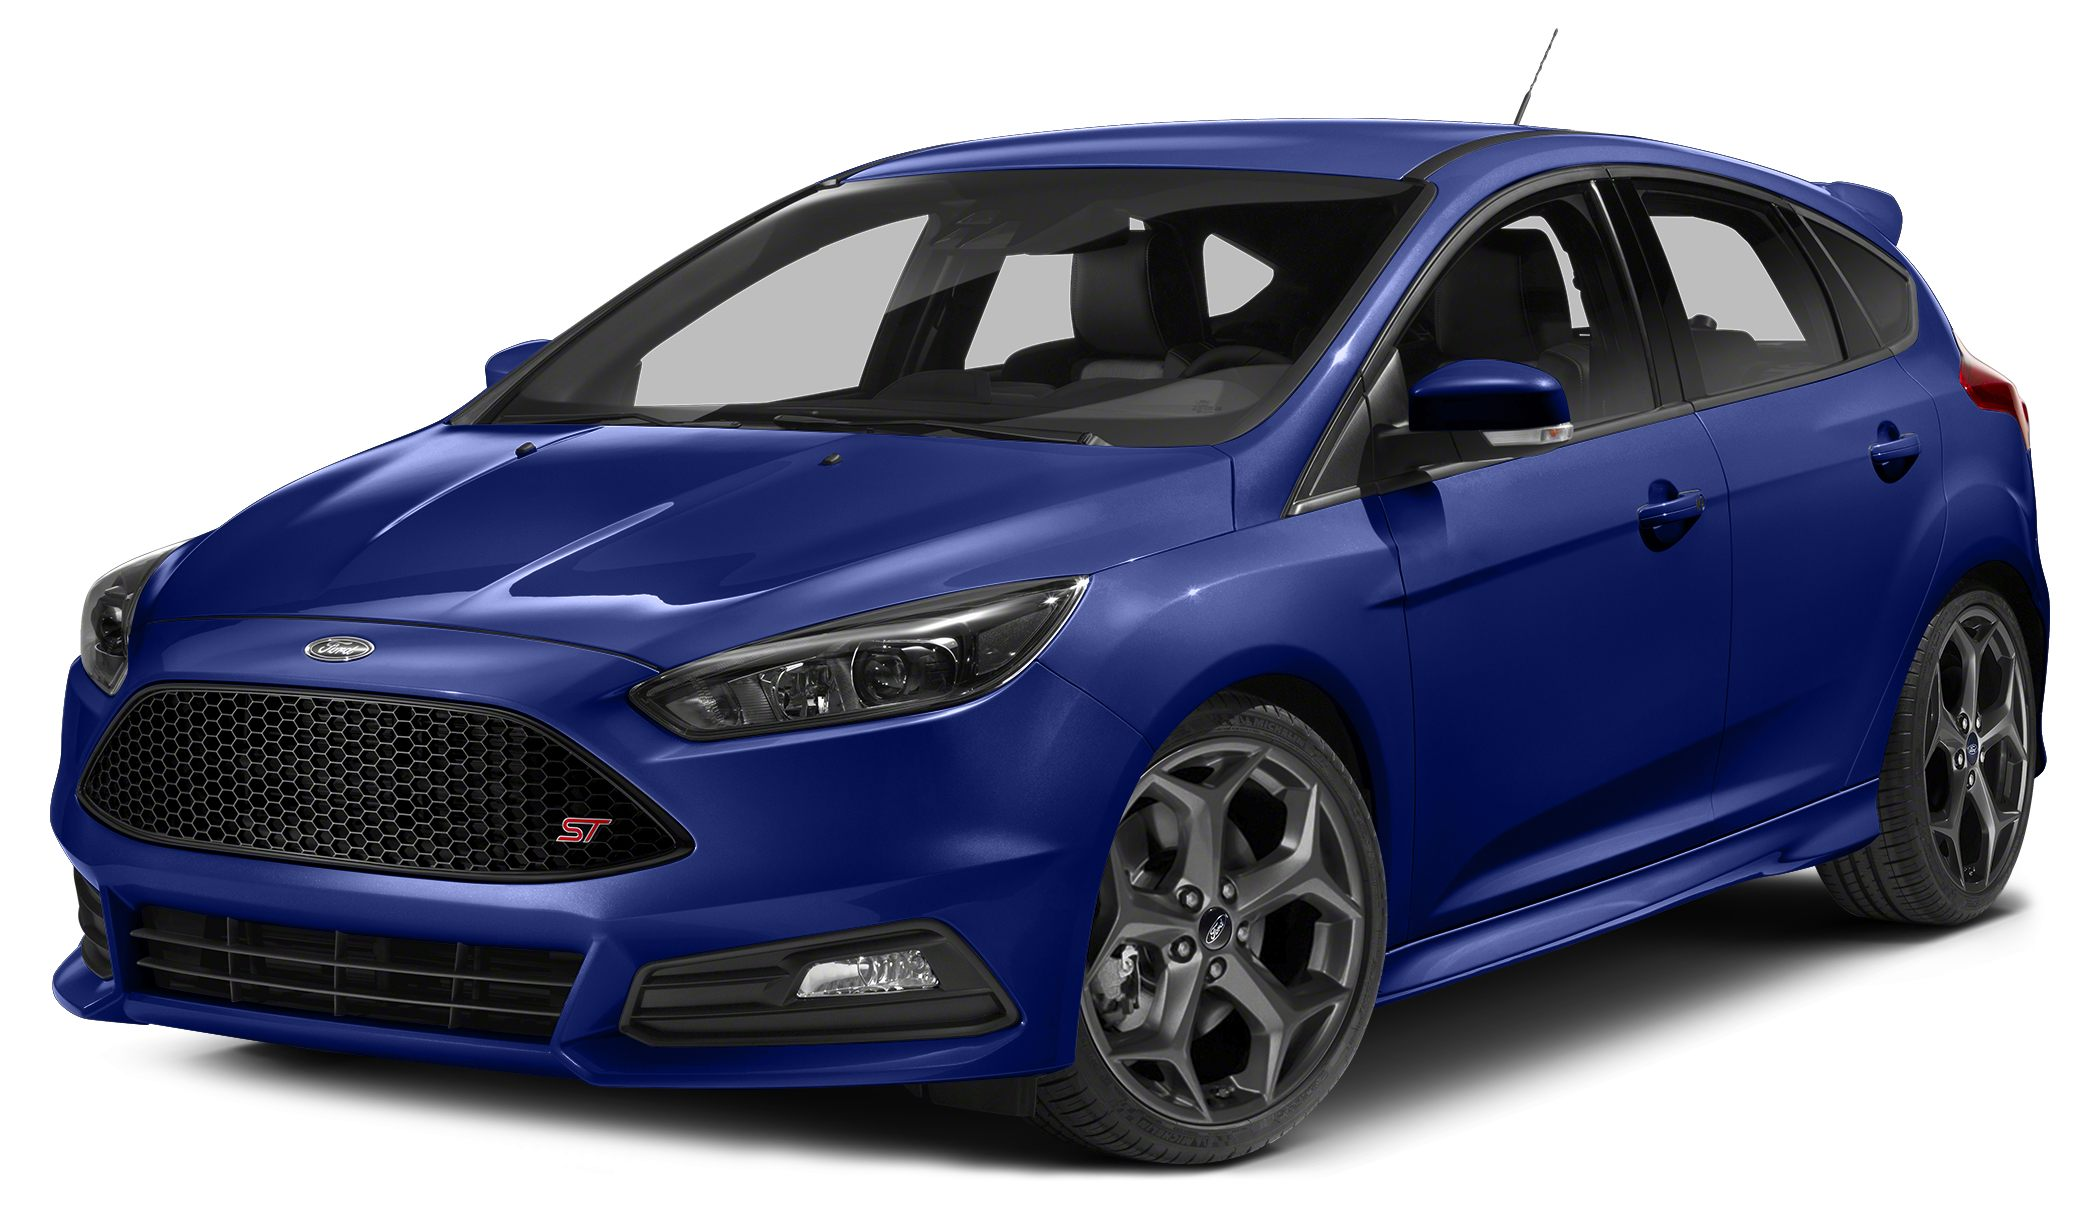 name pb2015stjpg views 8678 size 2640 kb - Ford Focus St 2015 Blue